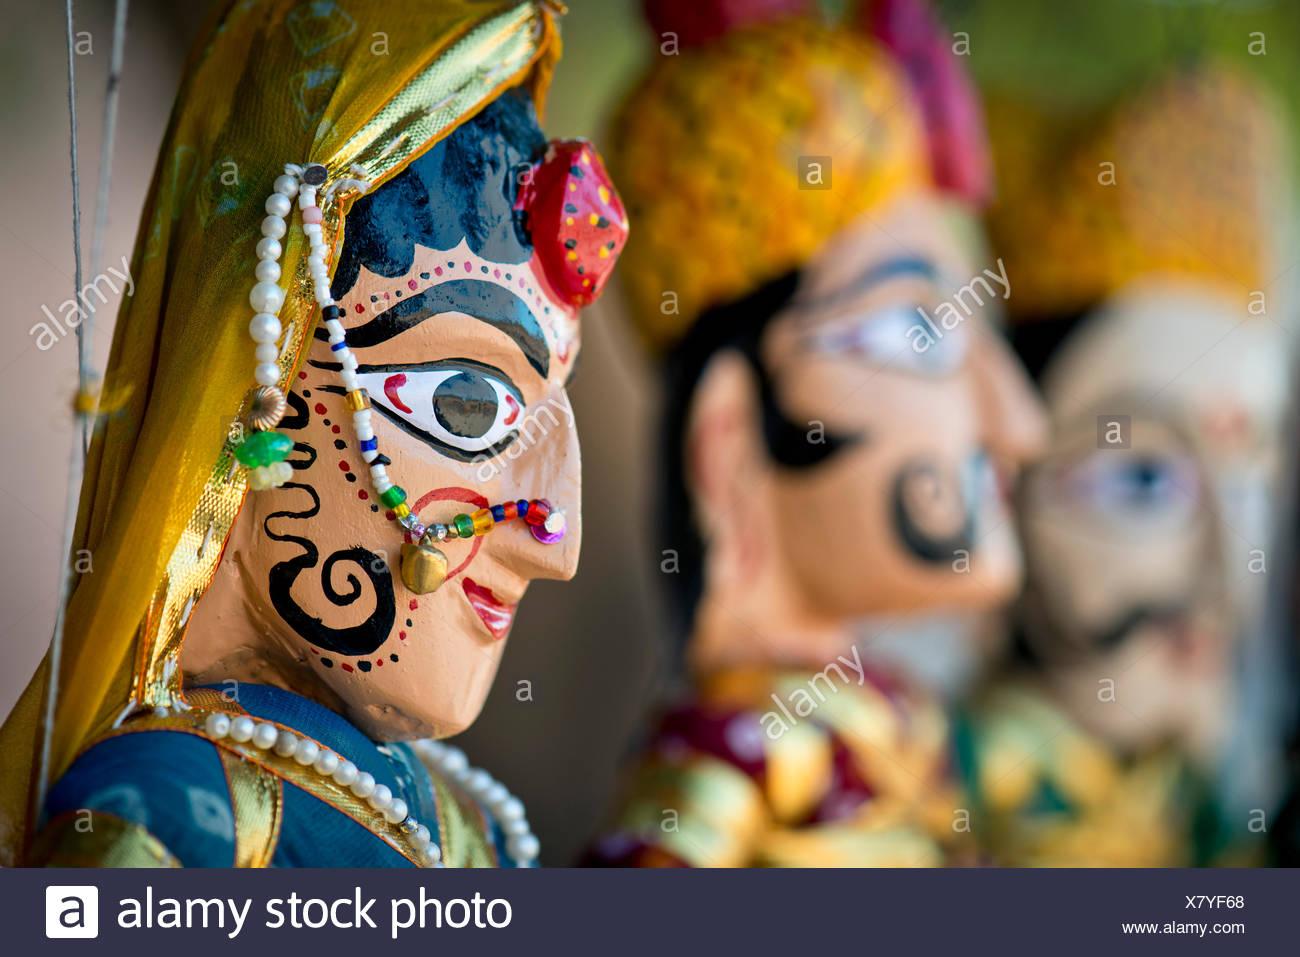 Marionettes, traditional crafts, Jodhpur, Rajasthan, India - Stock Image